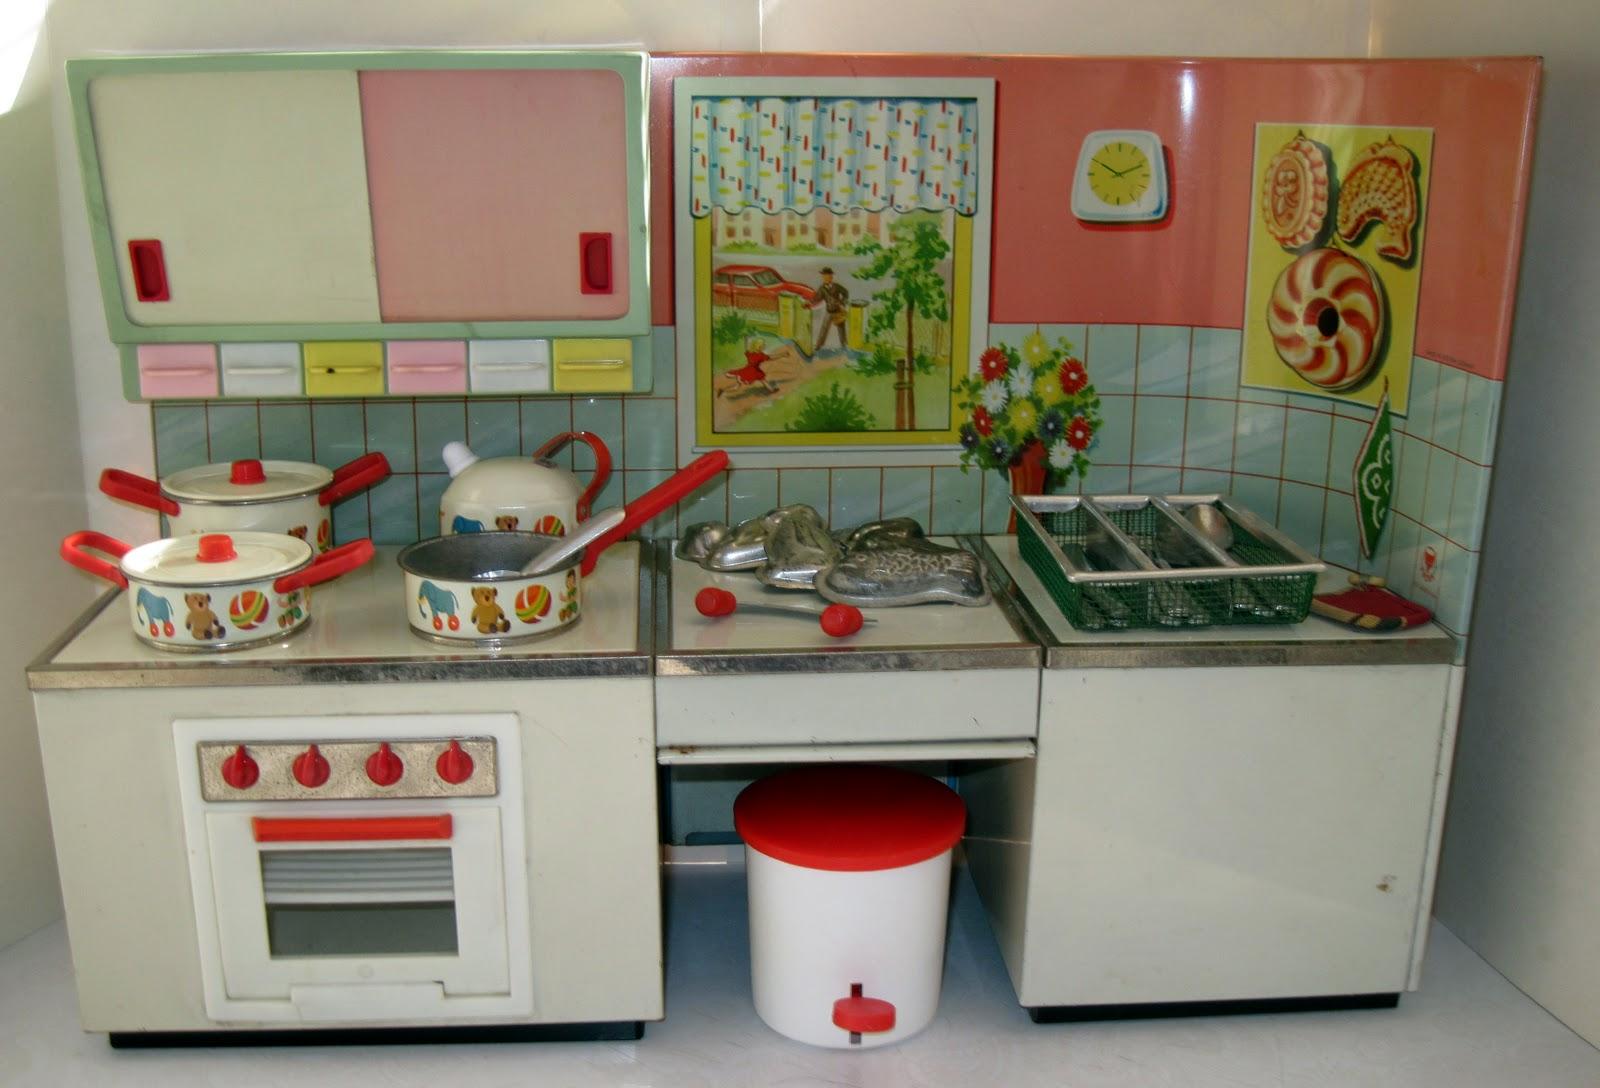 PDF DIY Plans For Wooden Kitchen Playsets Download plans